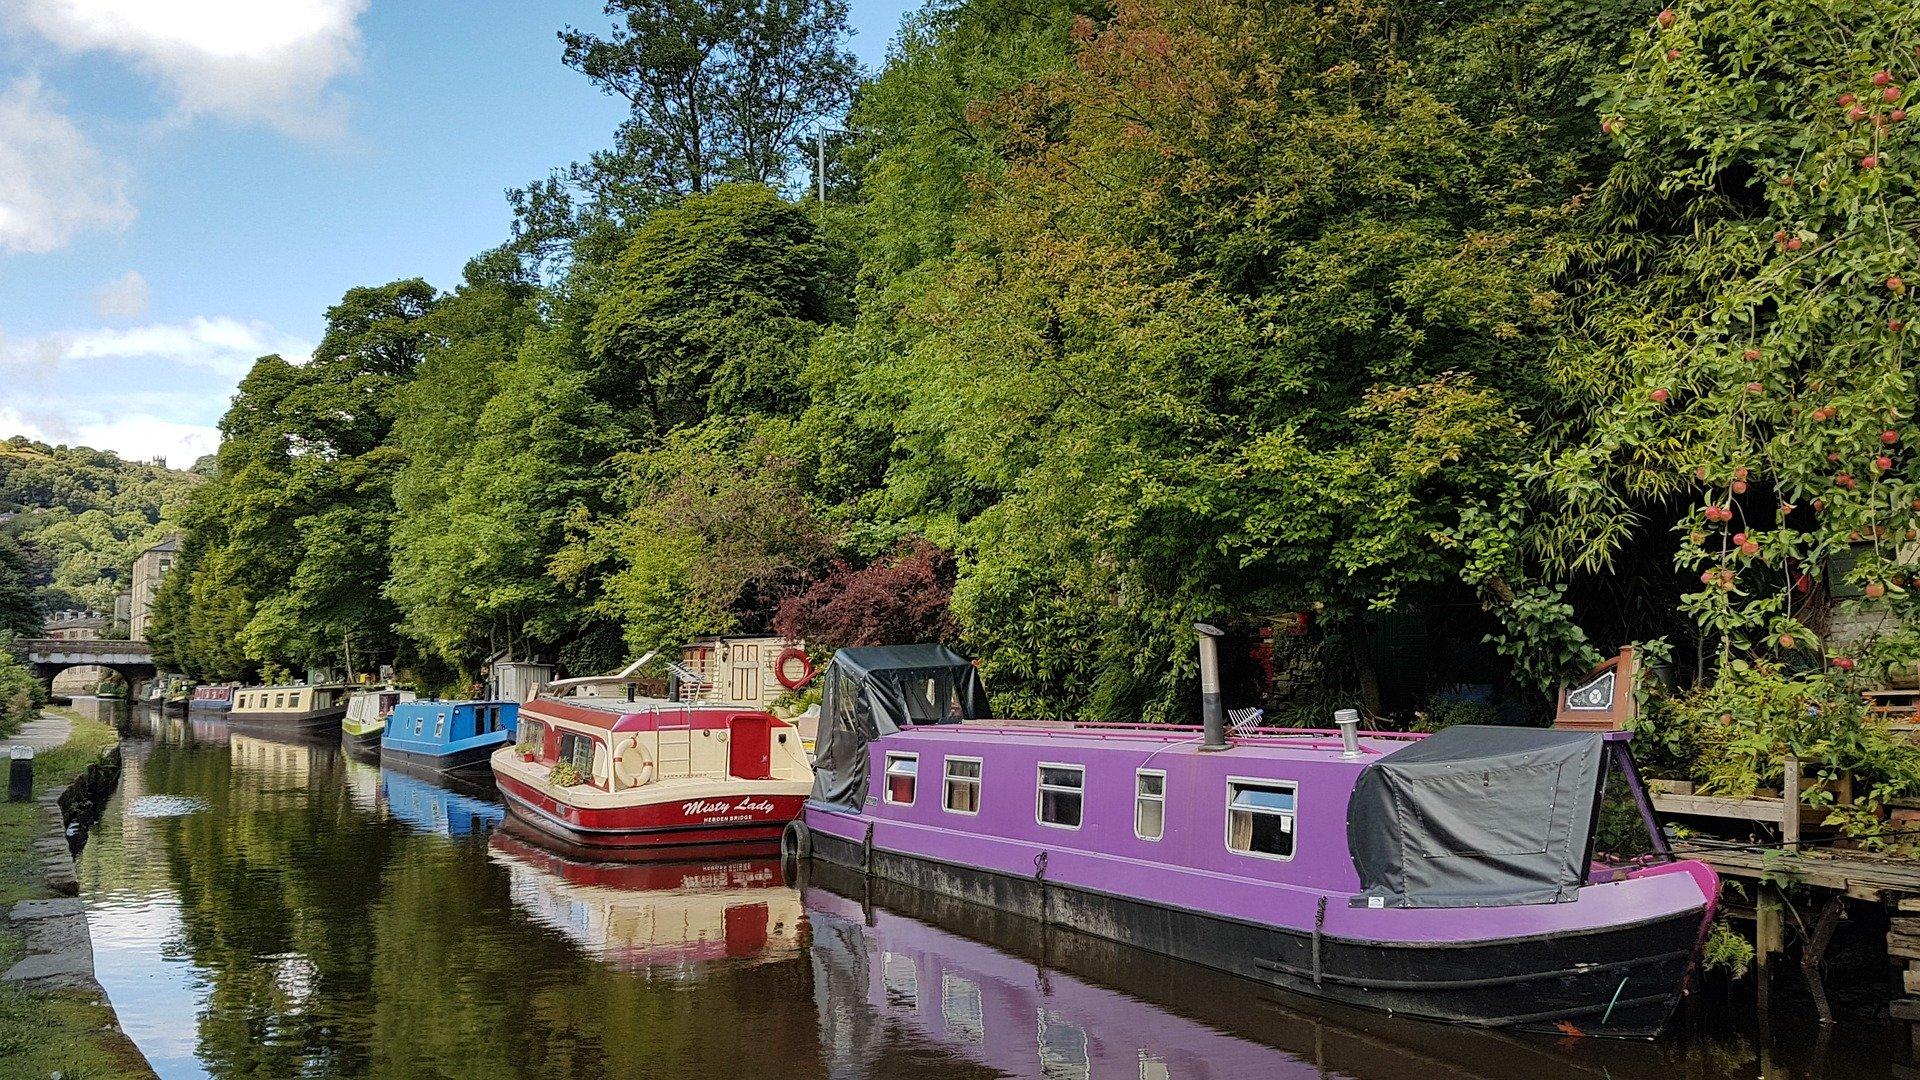 narrowboats on canal